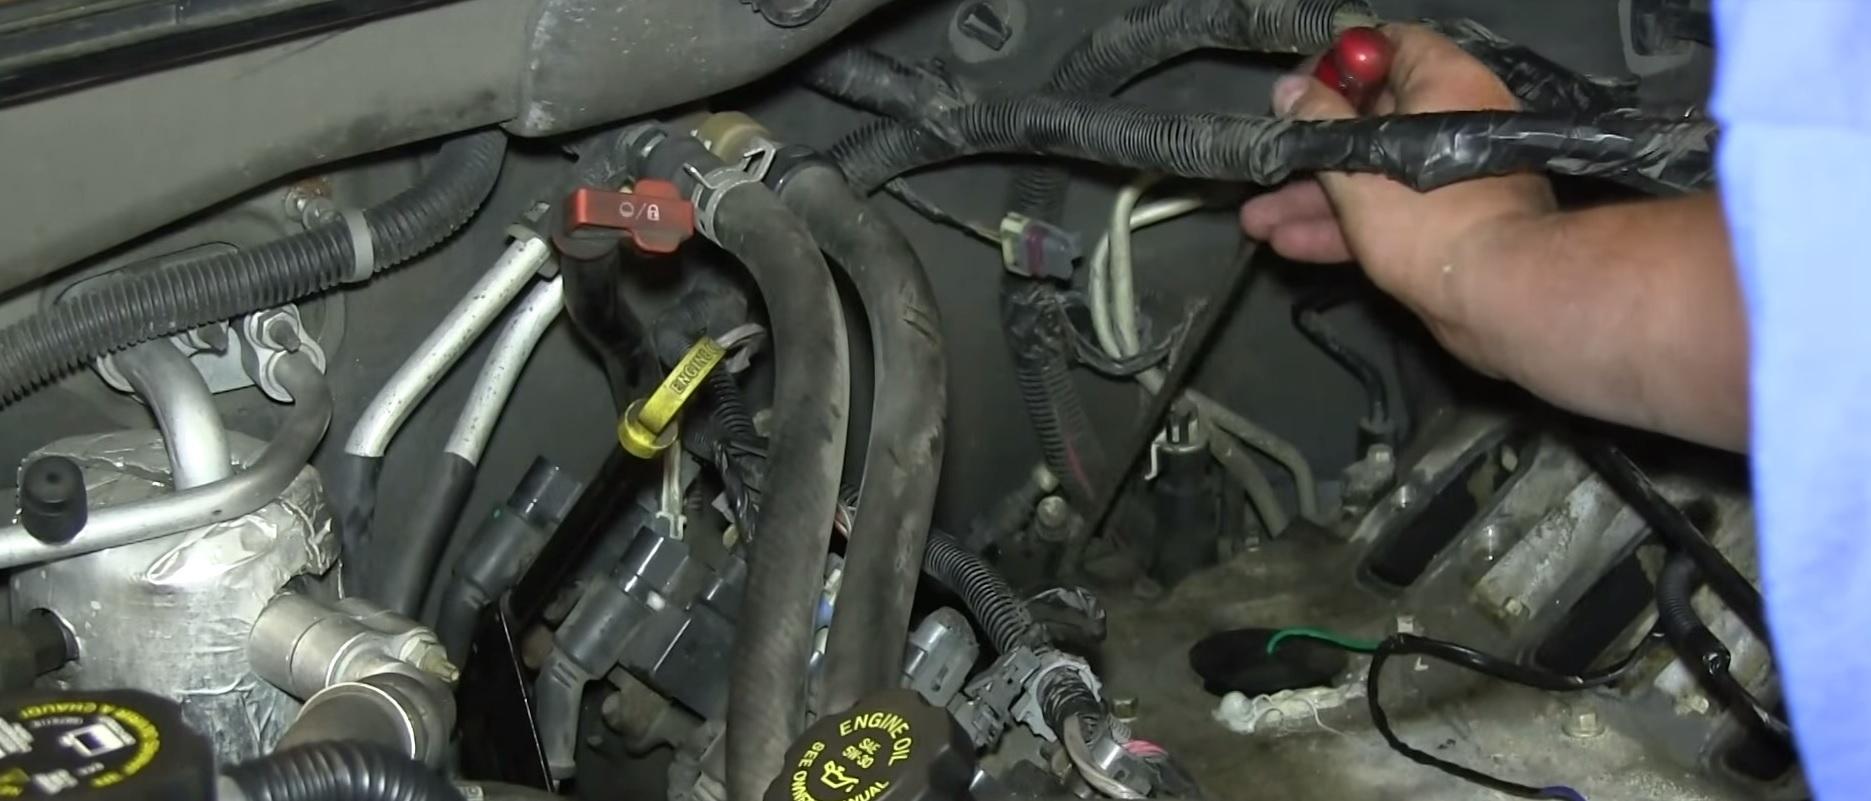 2005 chevy equinox engine diagram semi truck trailer plug wiring parts dodge stratus